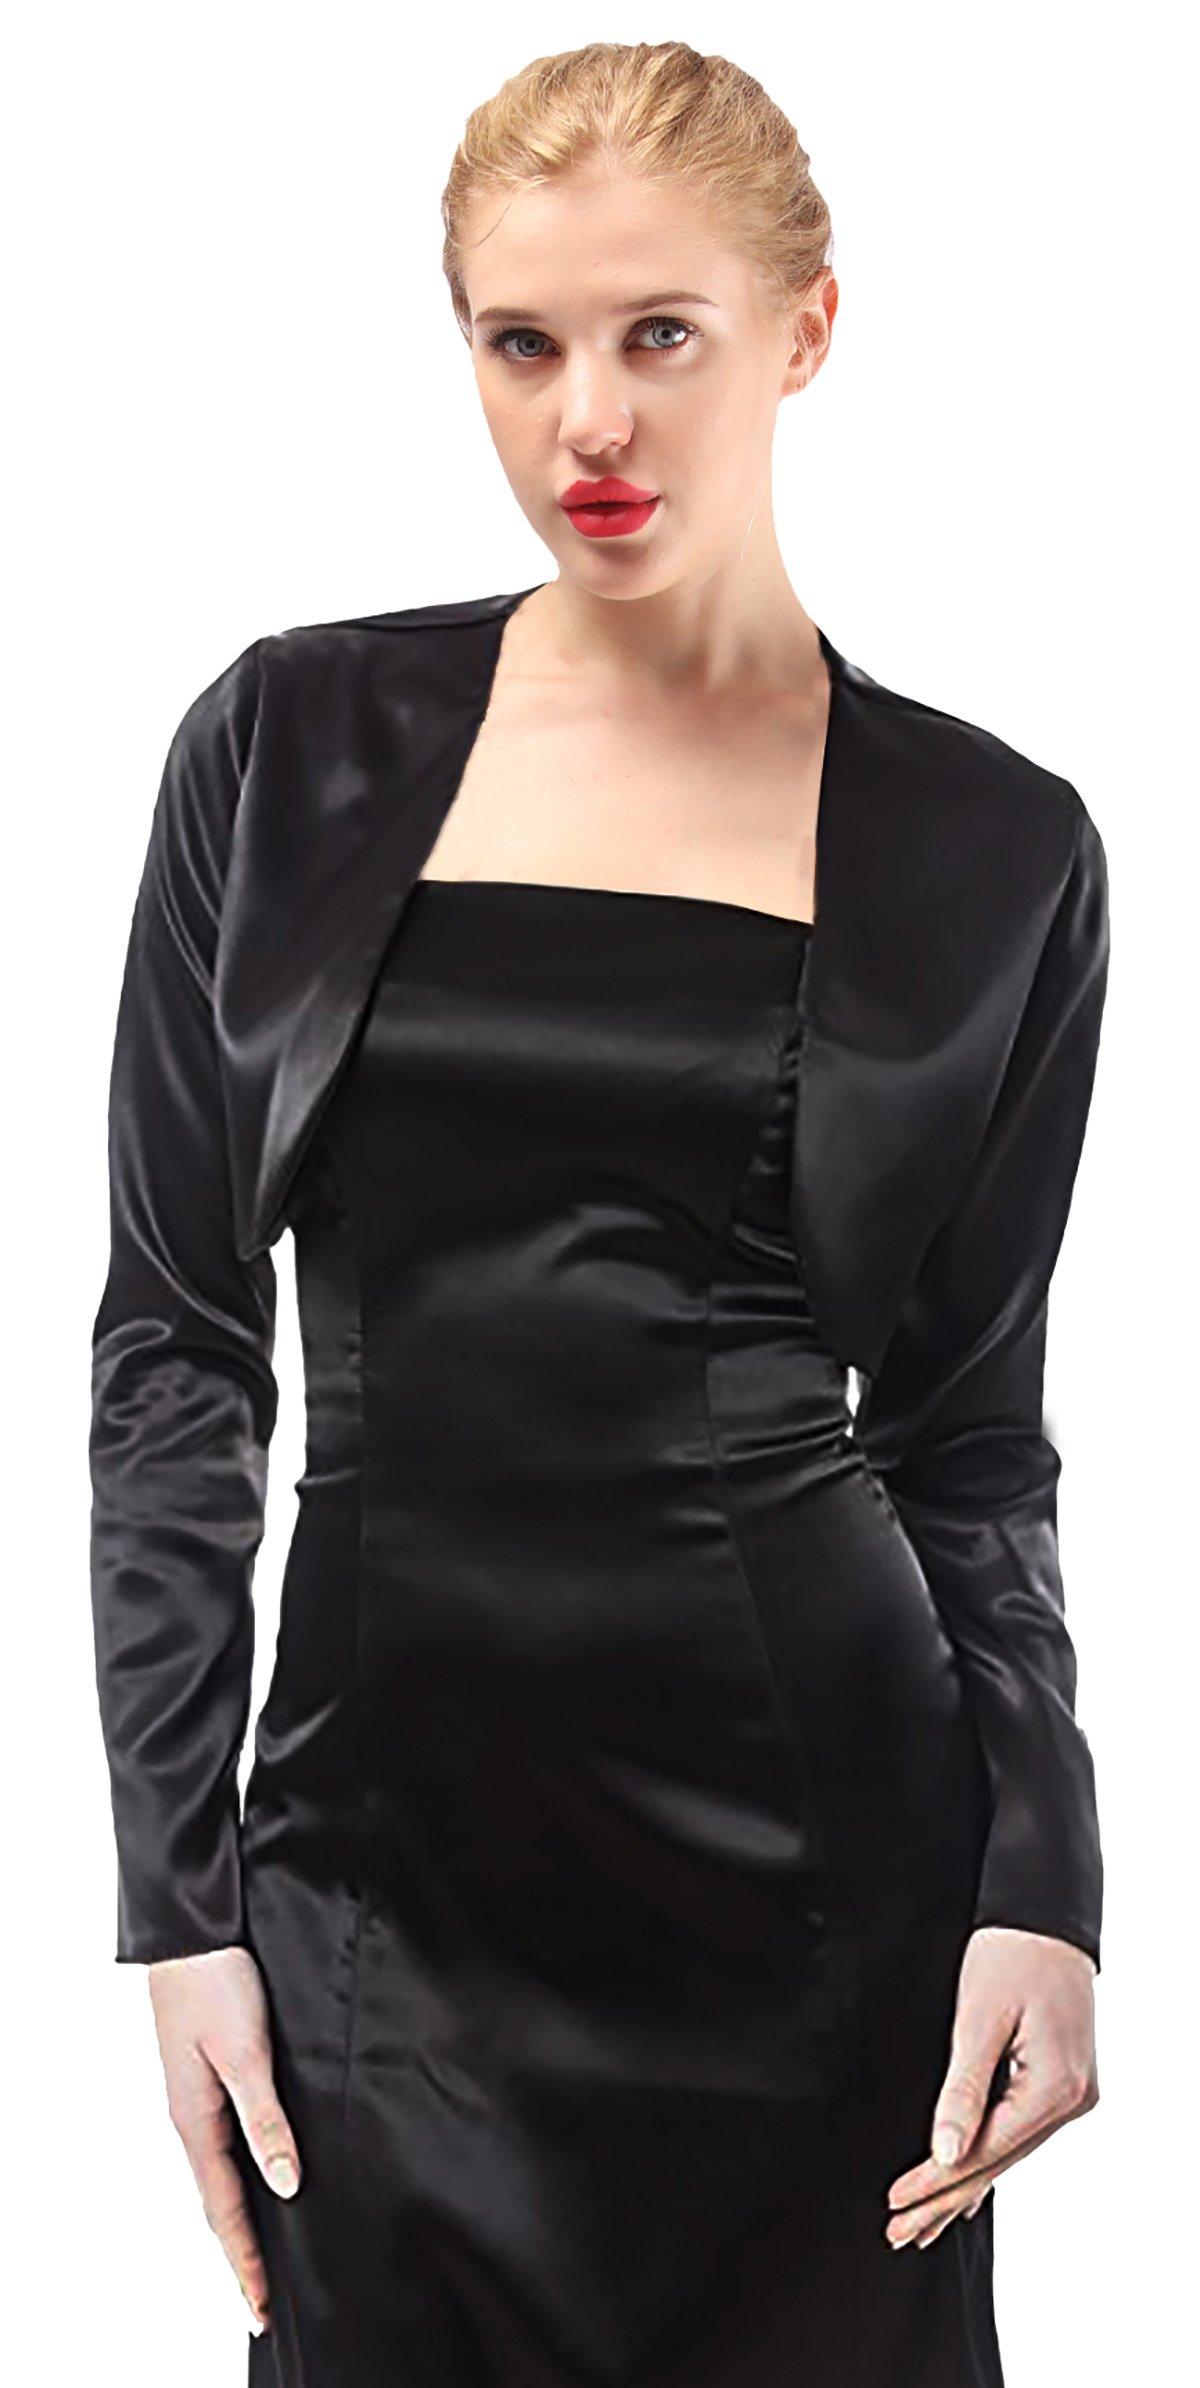 Alivila.Y Fashion Womens Satin Long Sleeve Bolero Shrug Jacket Cardigan A29-Black-XL